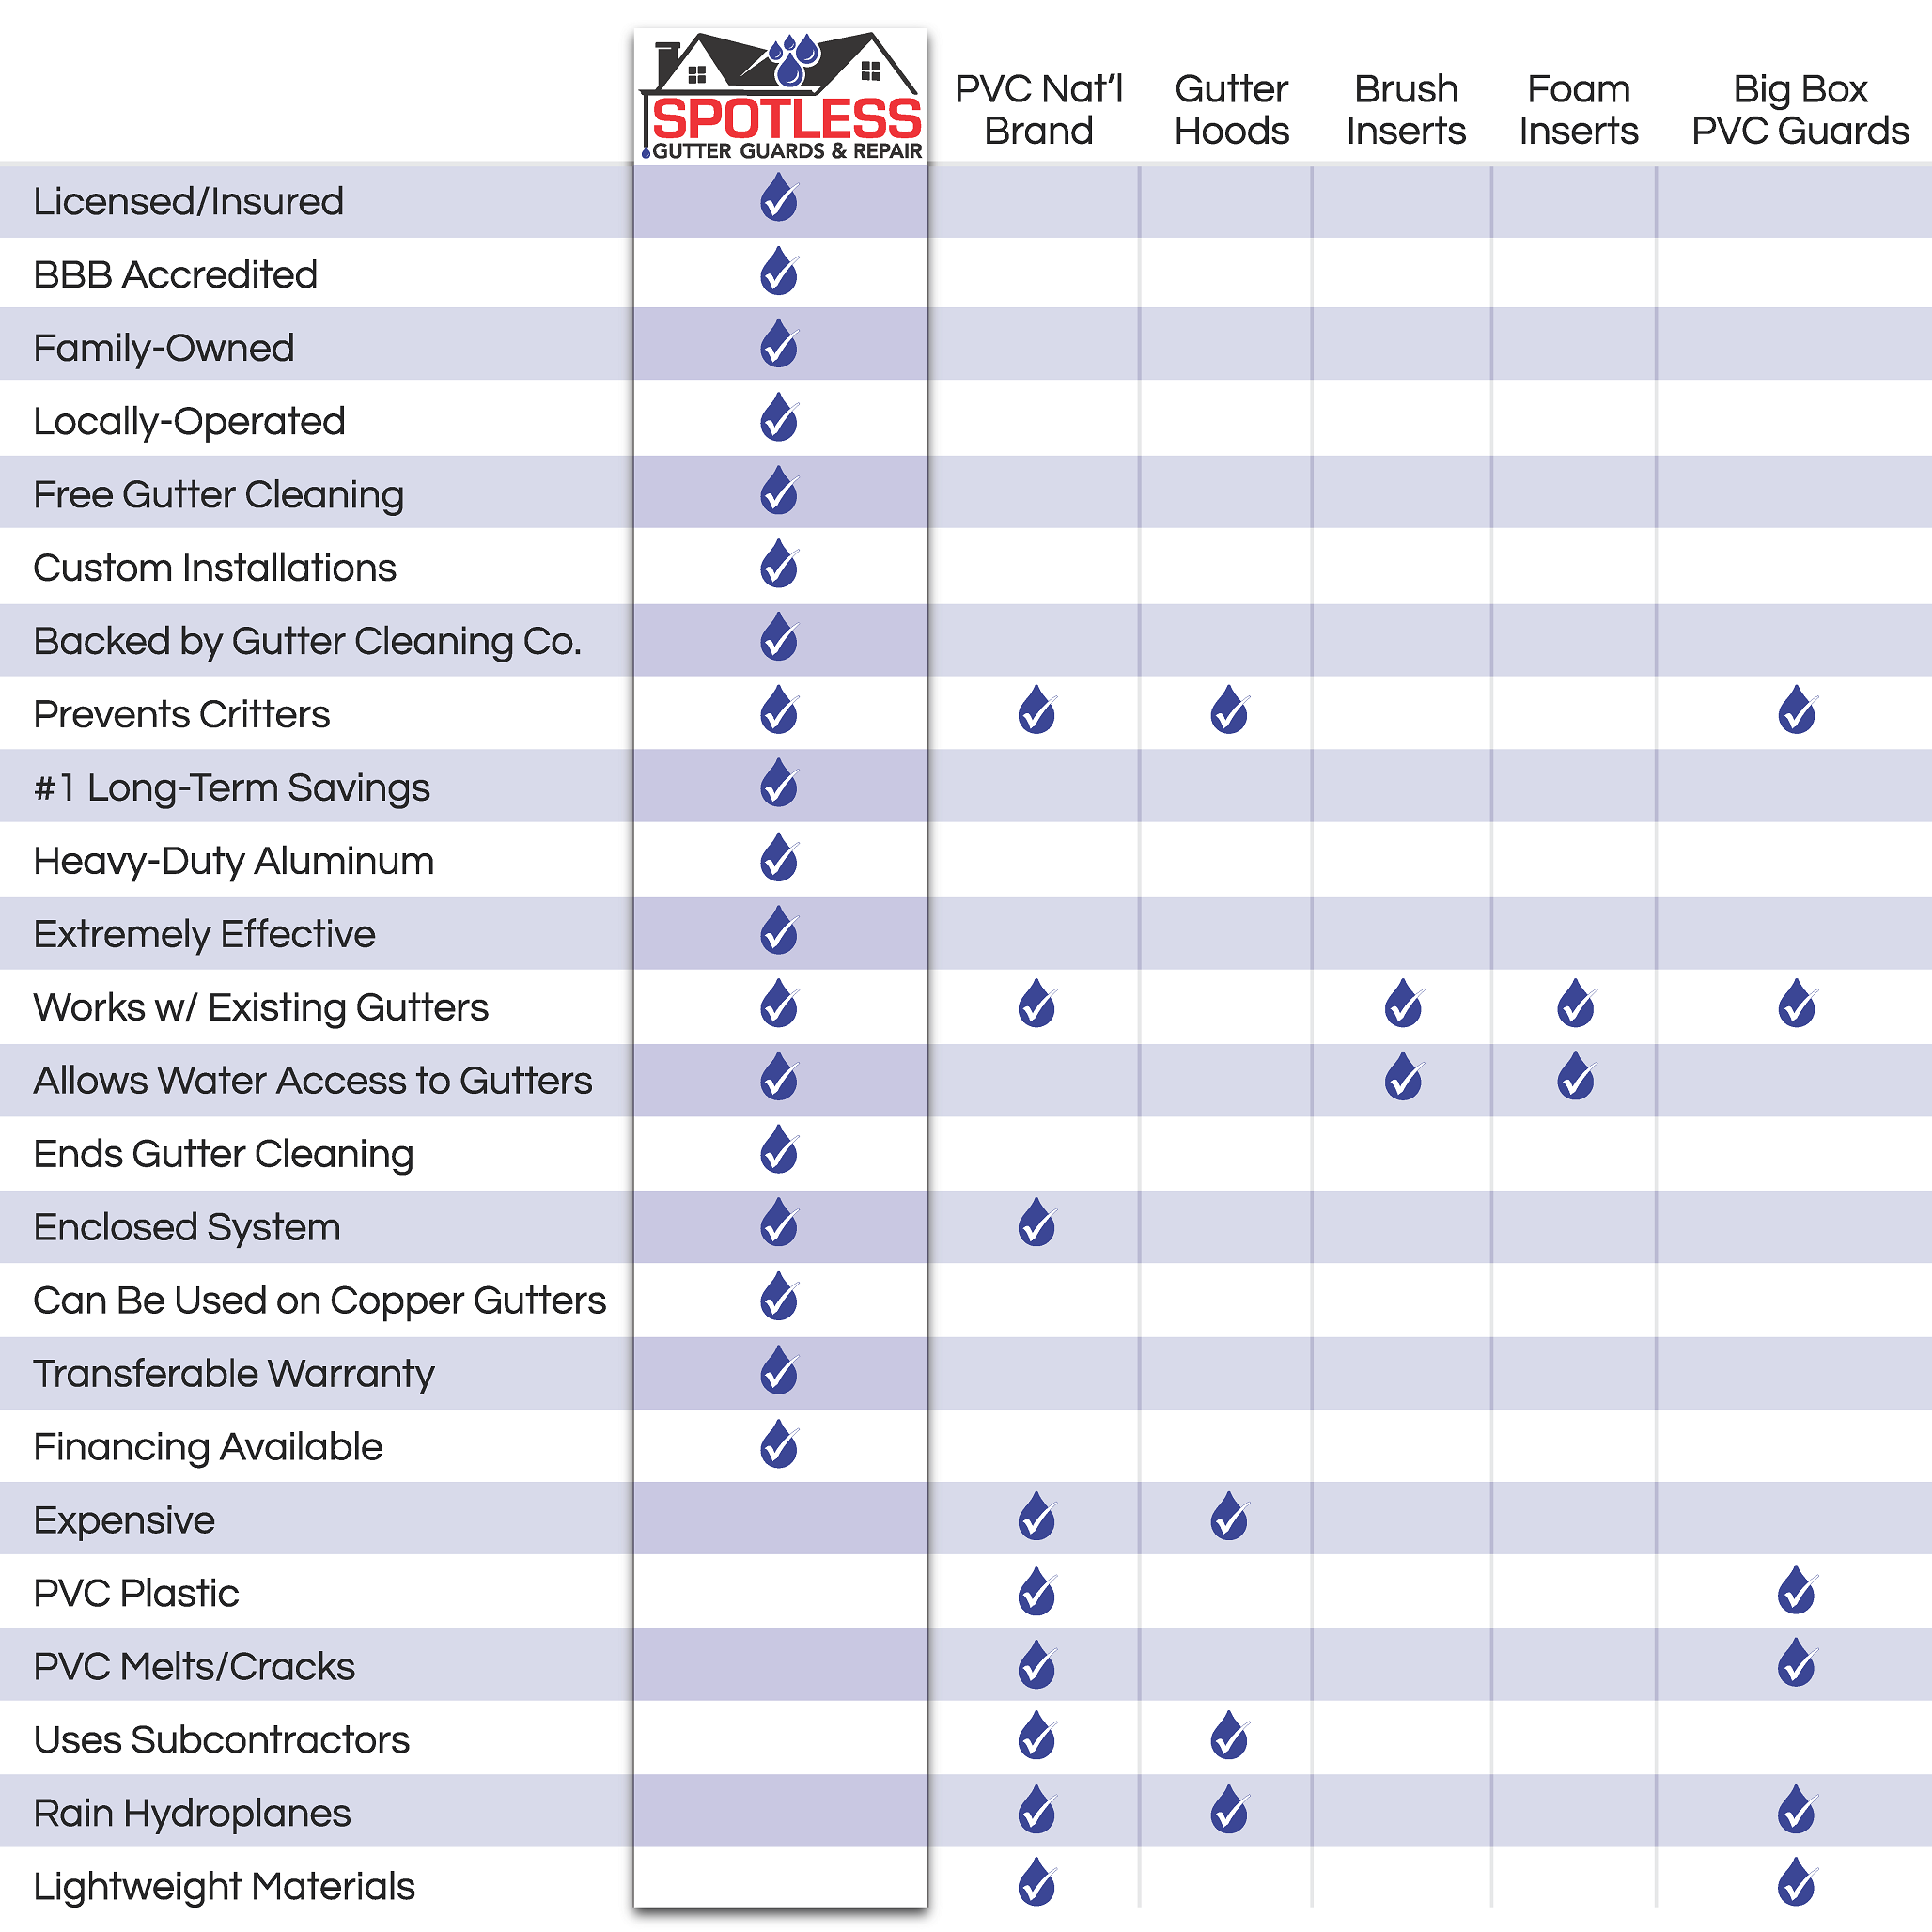 Spotless gutter guards comparison chart